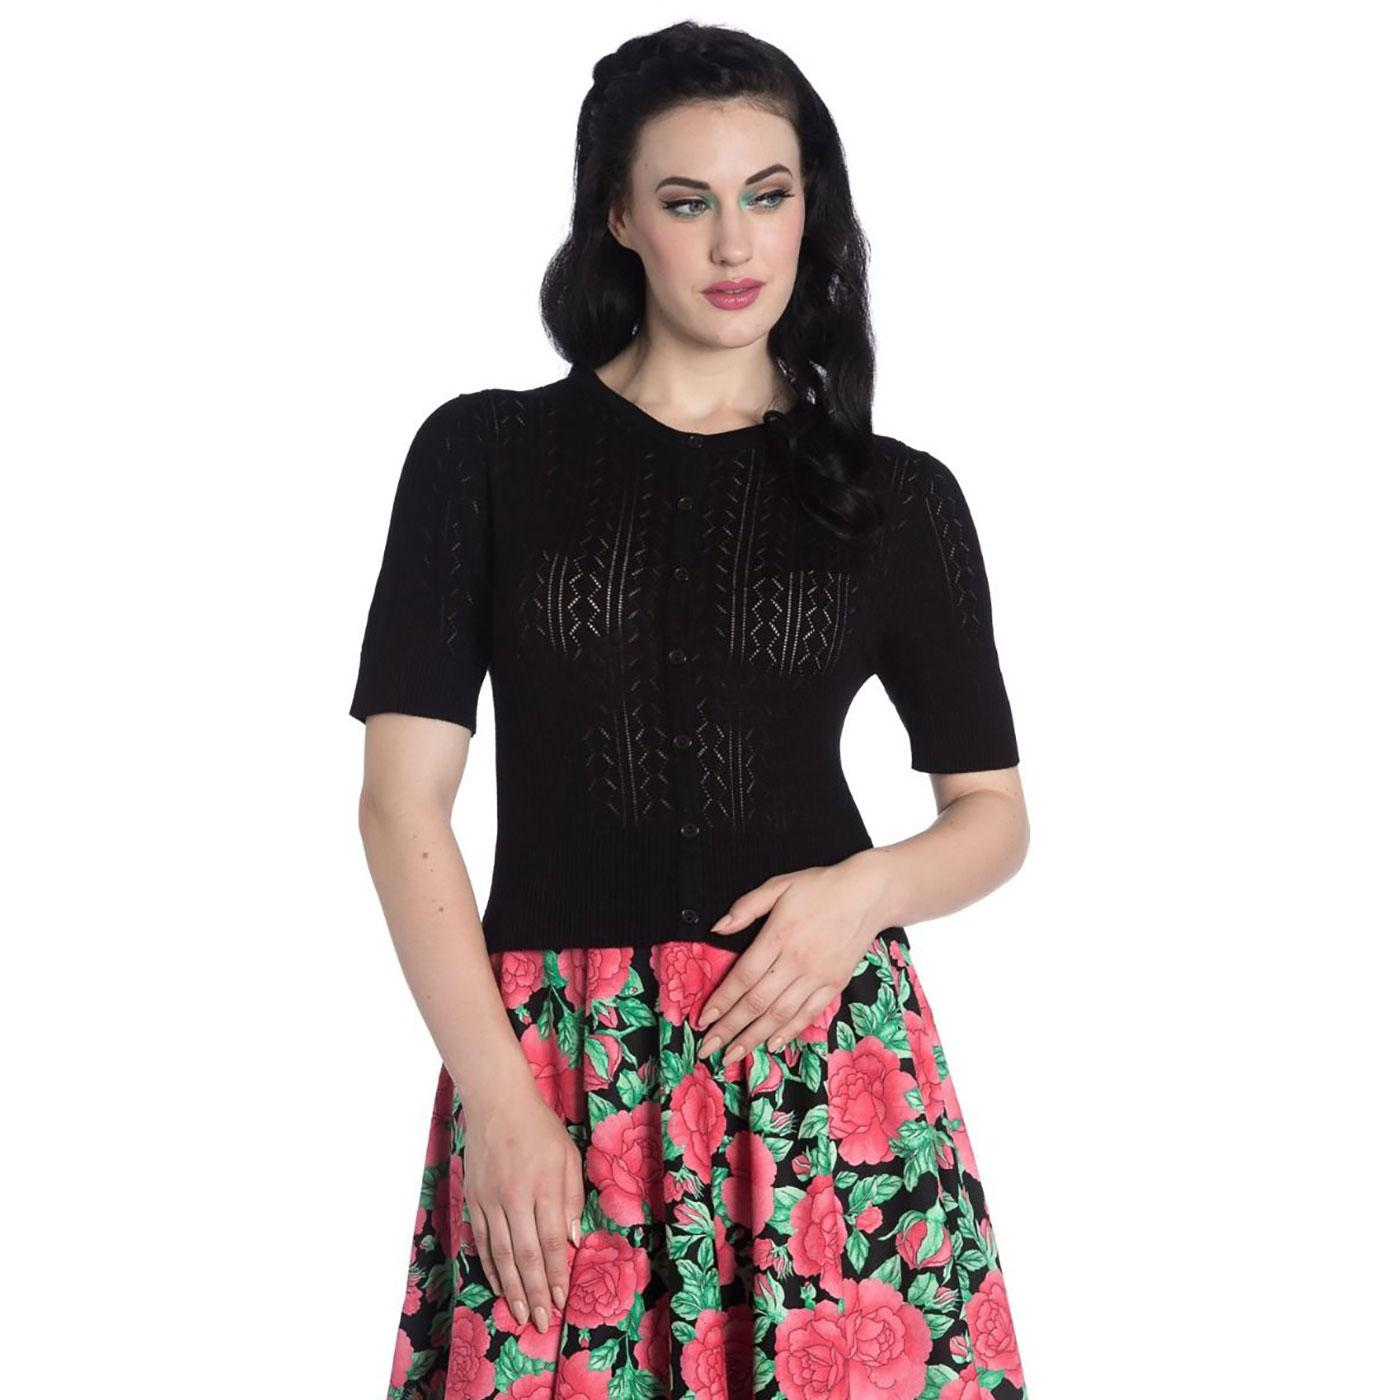 Loretta HELL BUNNY Vintage Knitted Cardigan Black